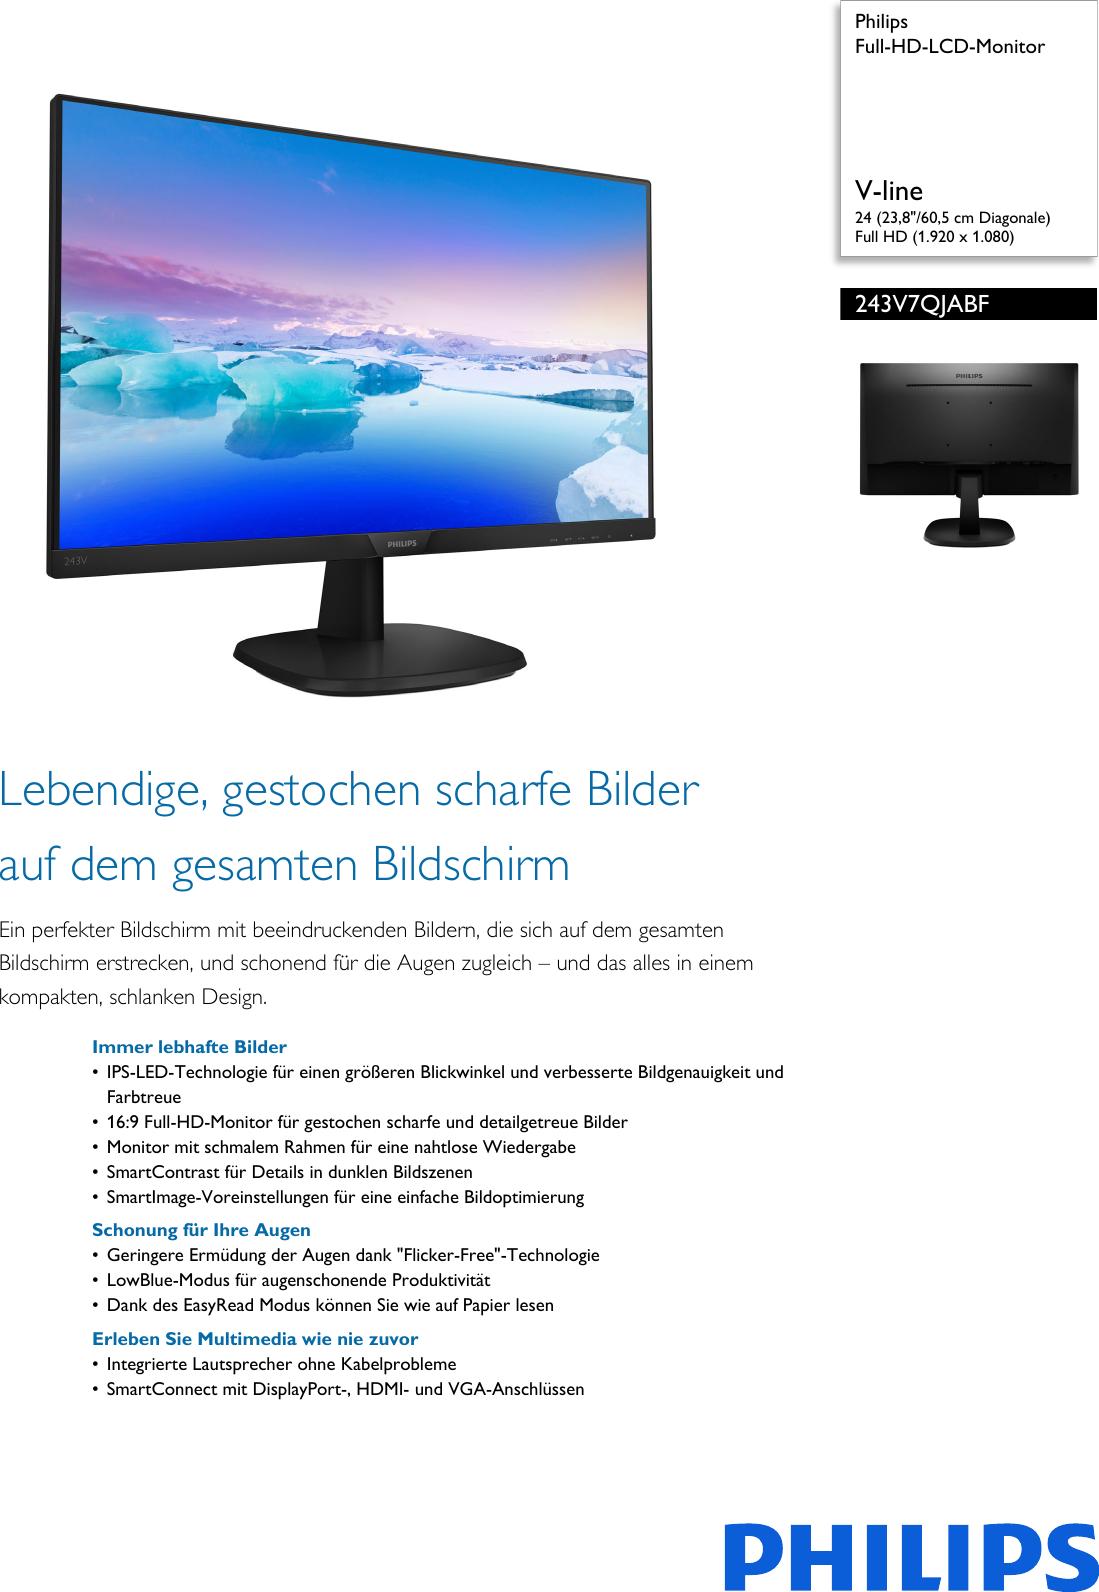 Philips 243V7QJABF/00 Leaflet 243V7QJABF_00 Released Germany (German ...